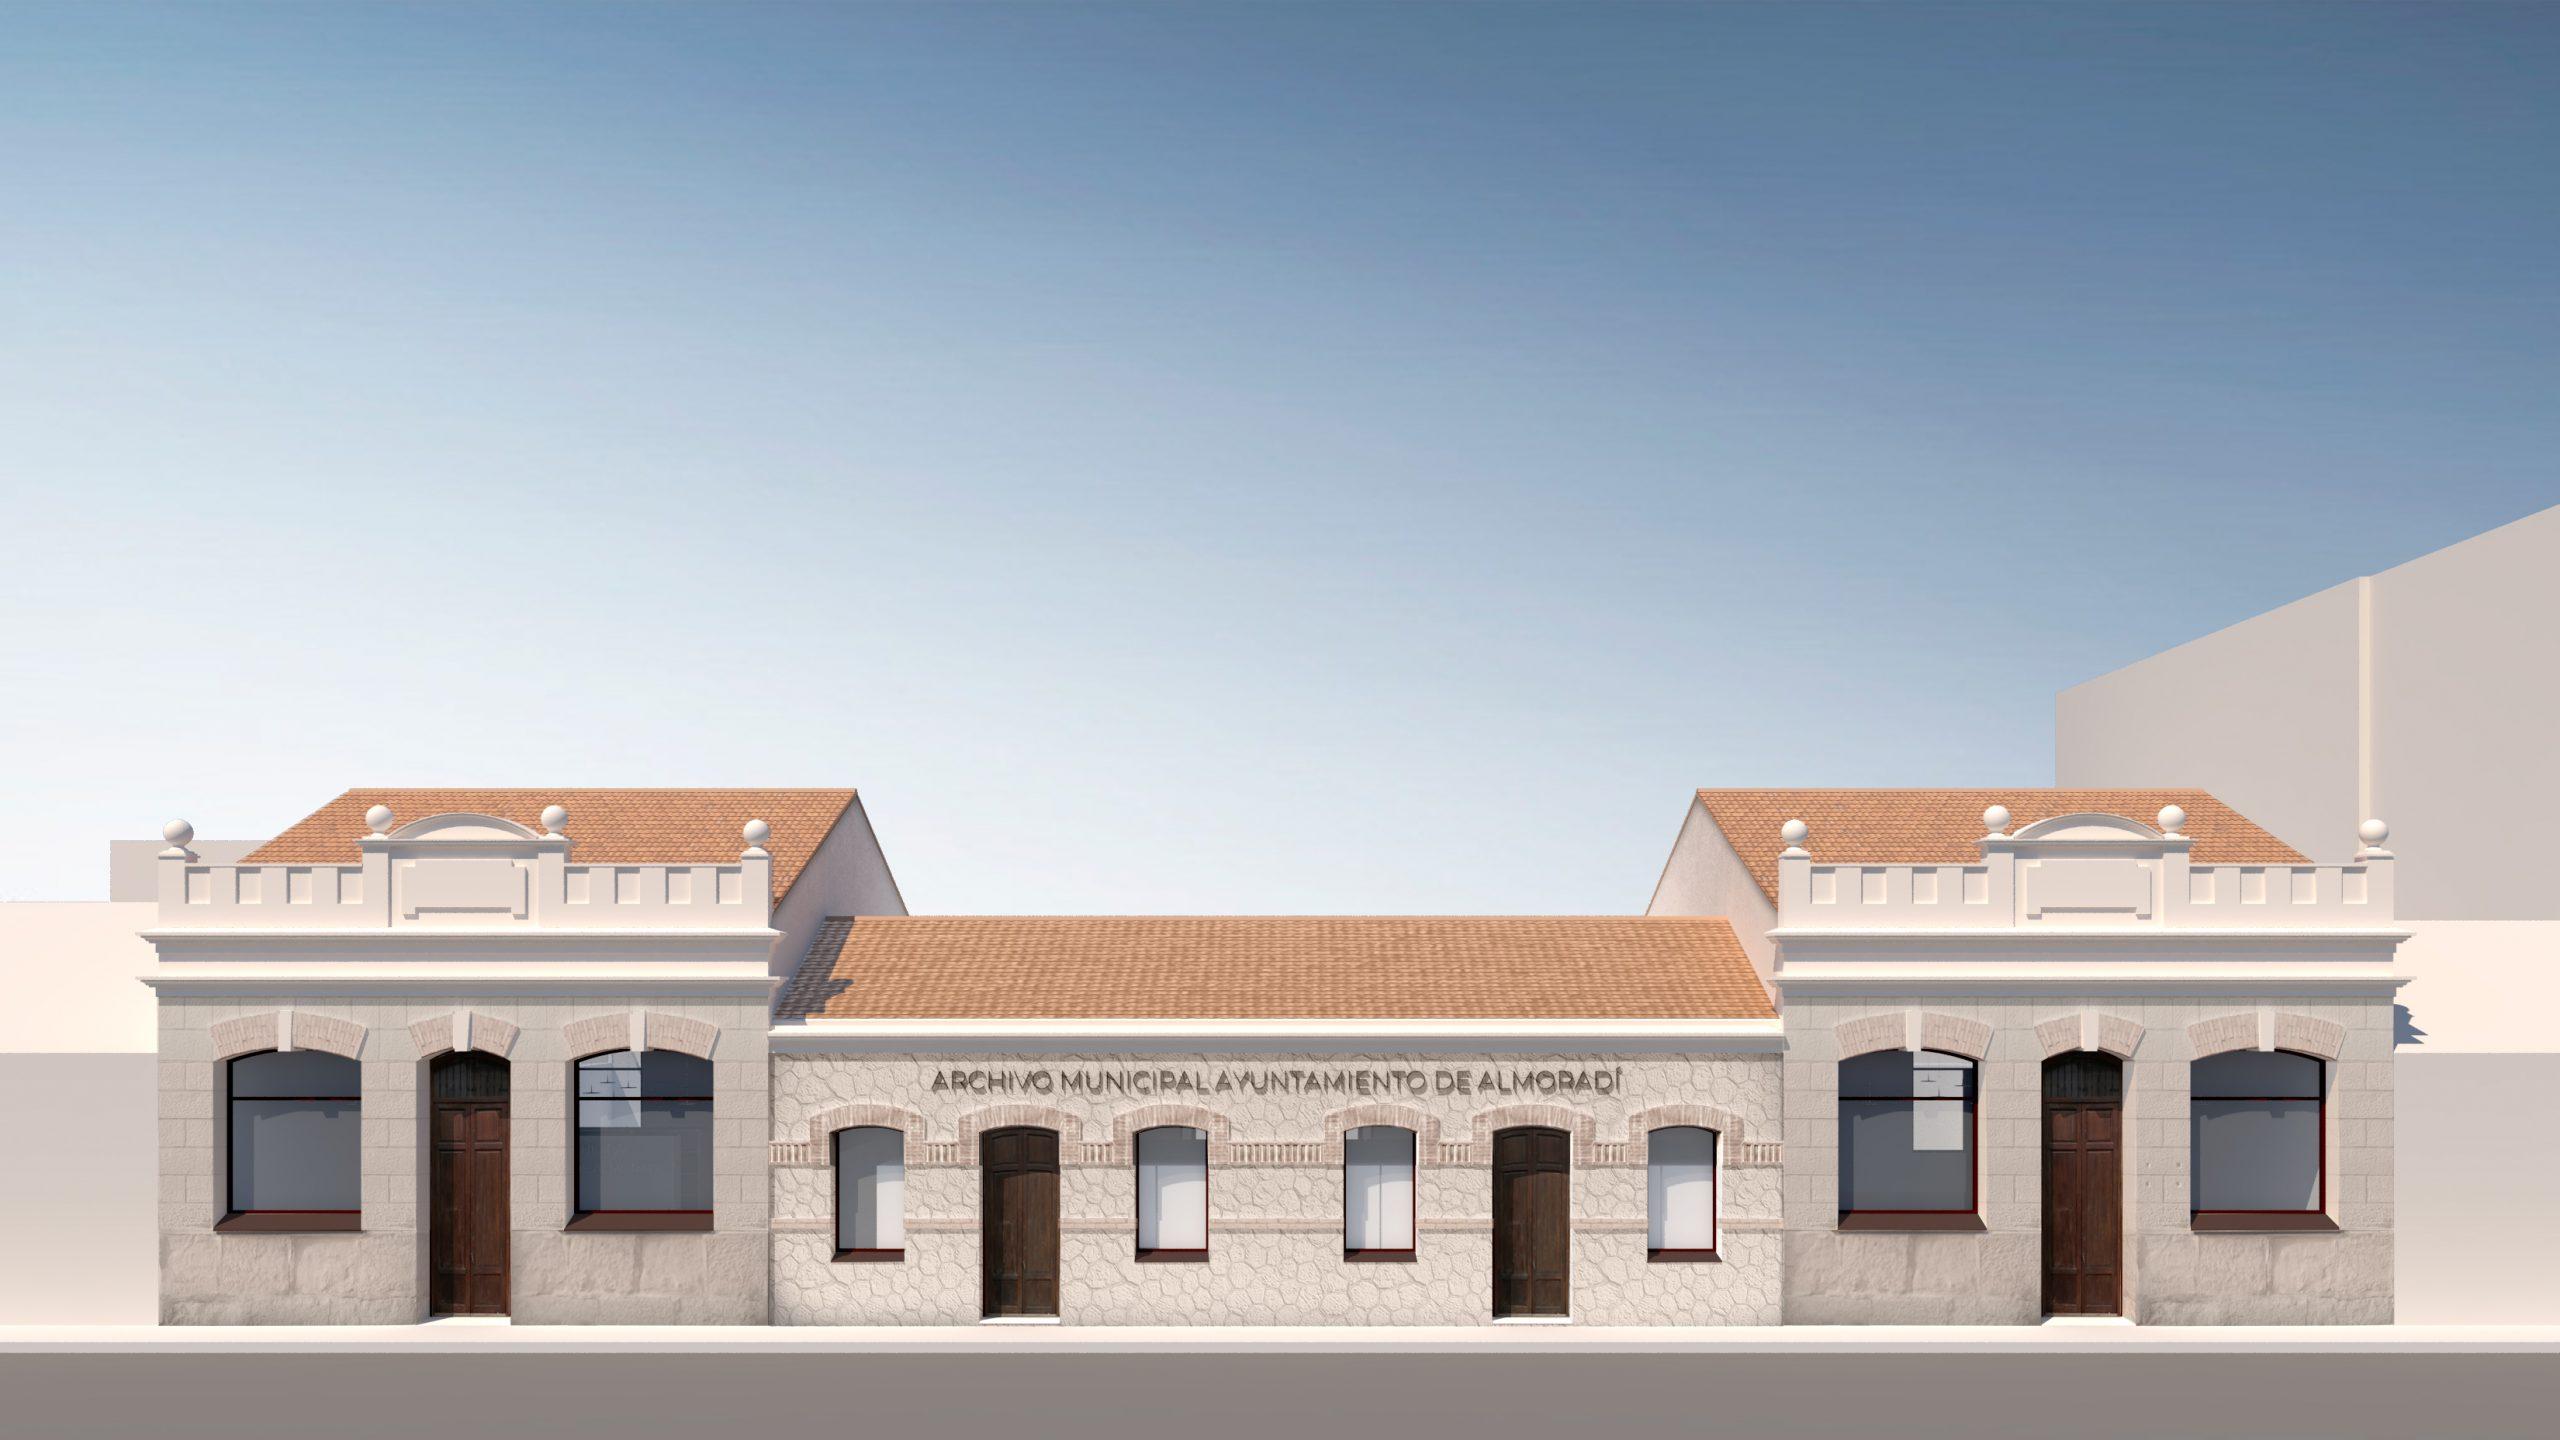 NAYA arquitectos alicante archivo municipal almoradi fachada principal